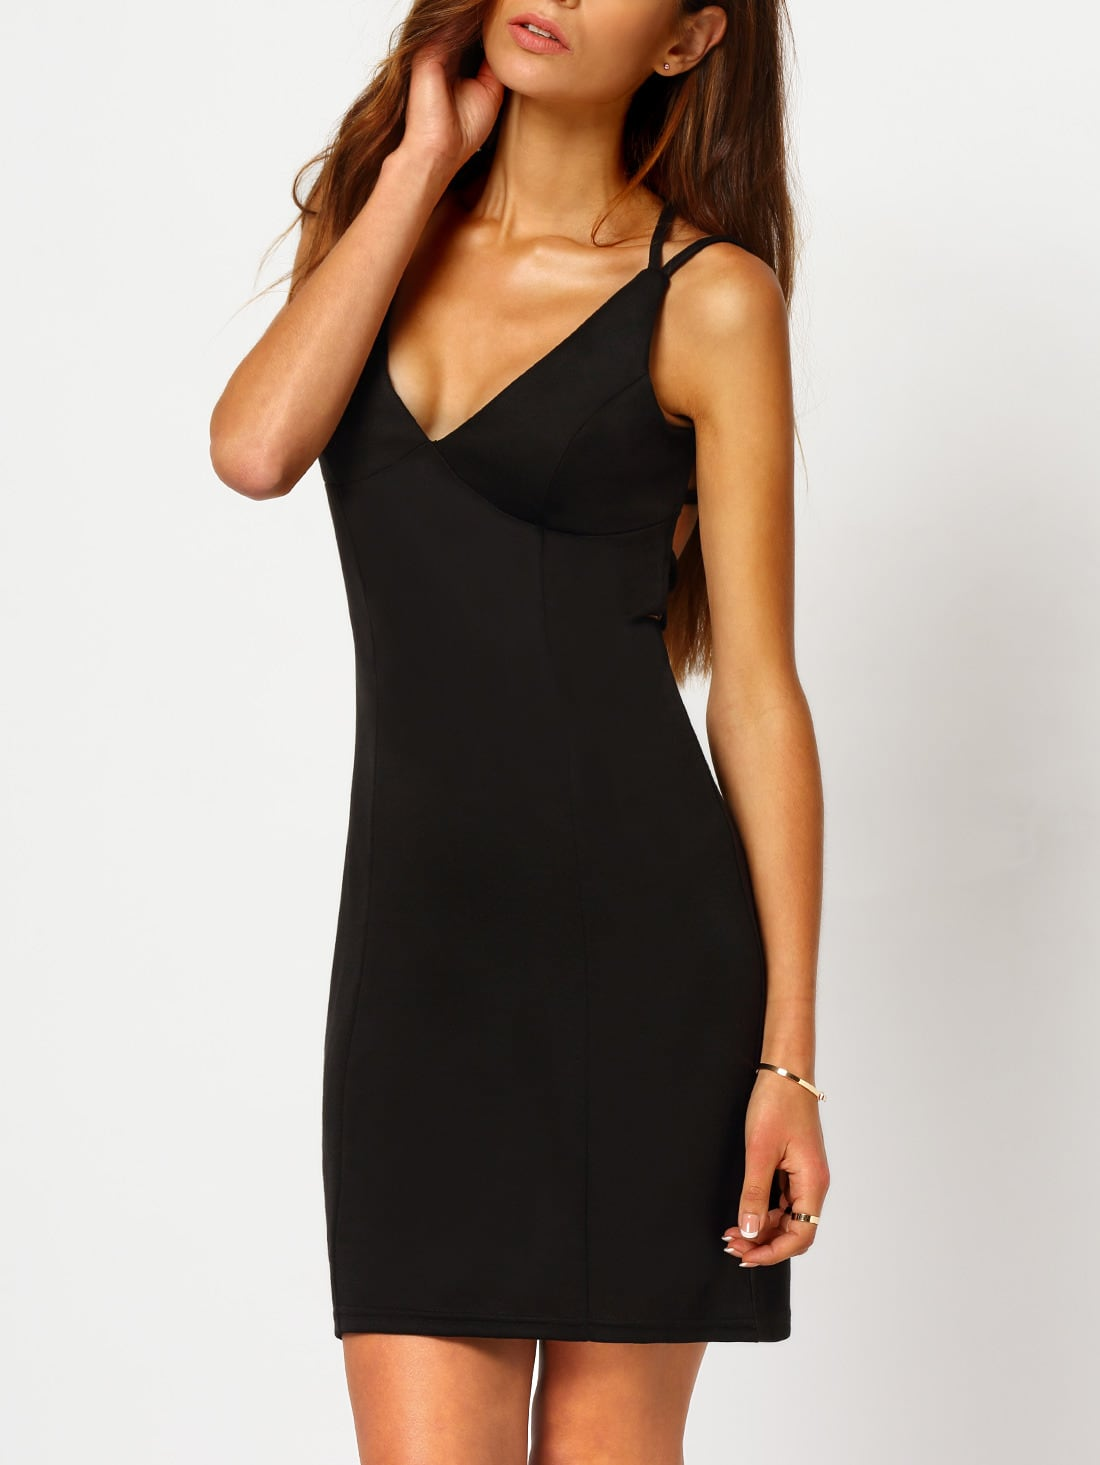 Elastic Spaghetti Plain Sleeveless Waist Dresses Strap Bodycon sleeves